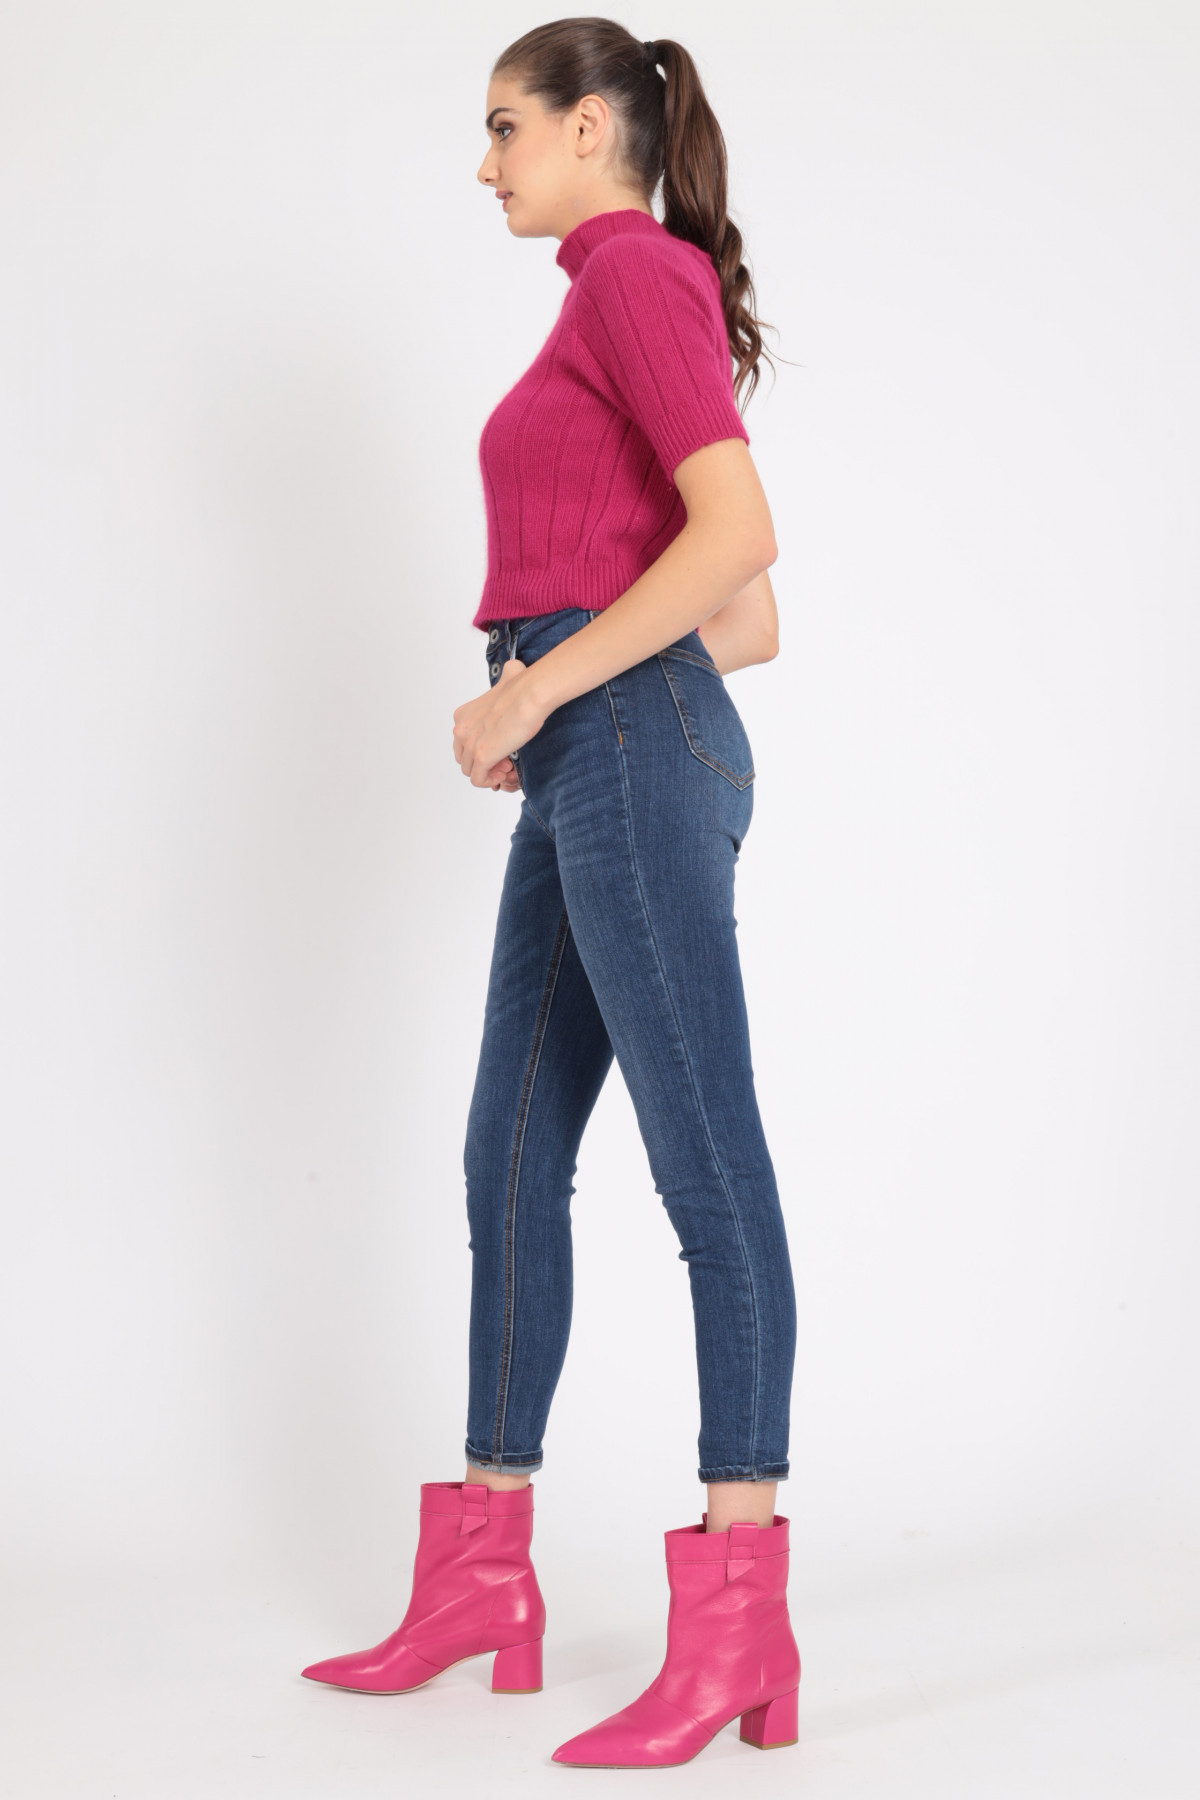 5 Pockets High Waist Skinny Stretch Jeans